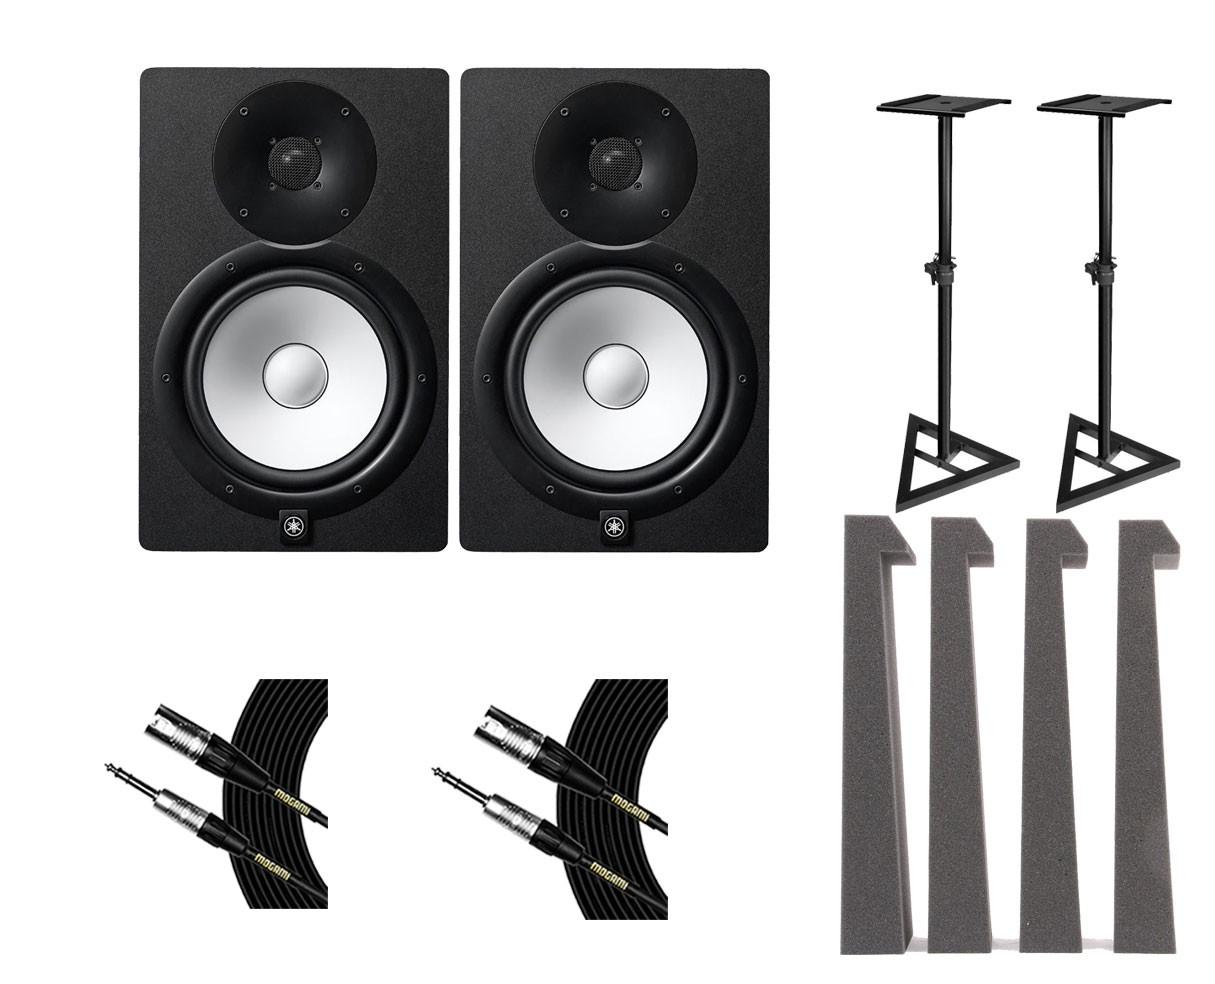 2x Yamaha HS8 + Stands + Mopads + Mogami Cables